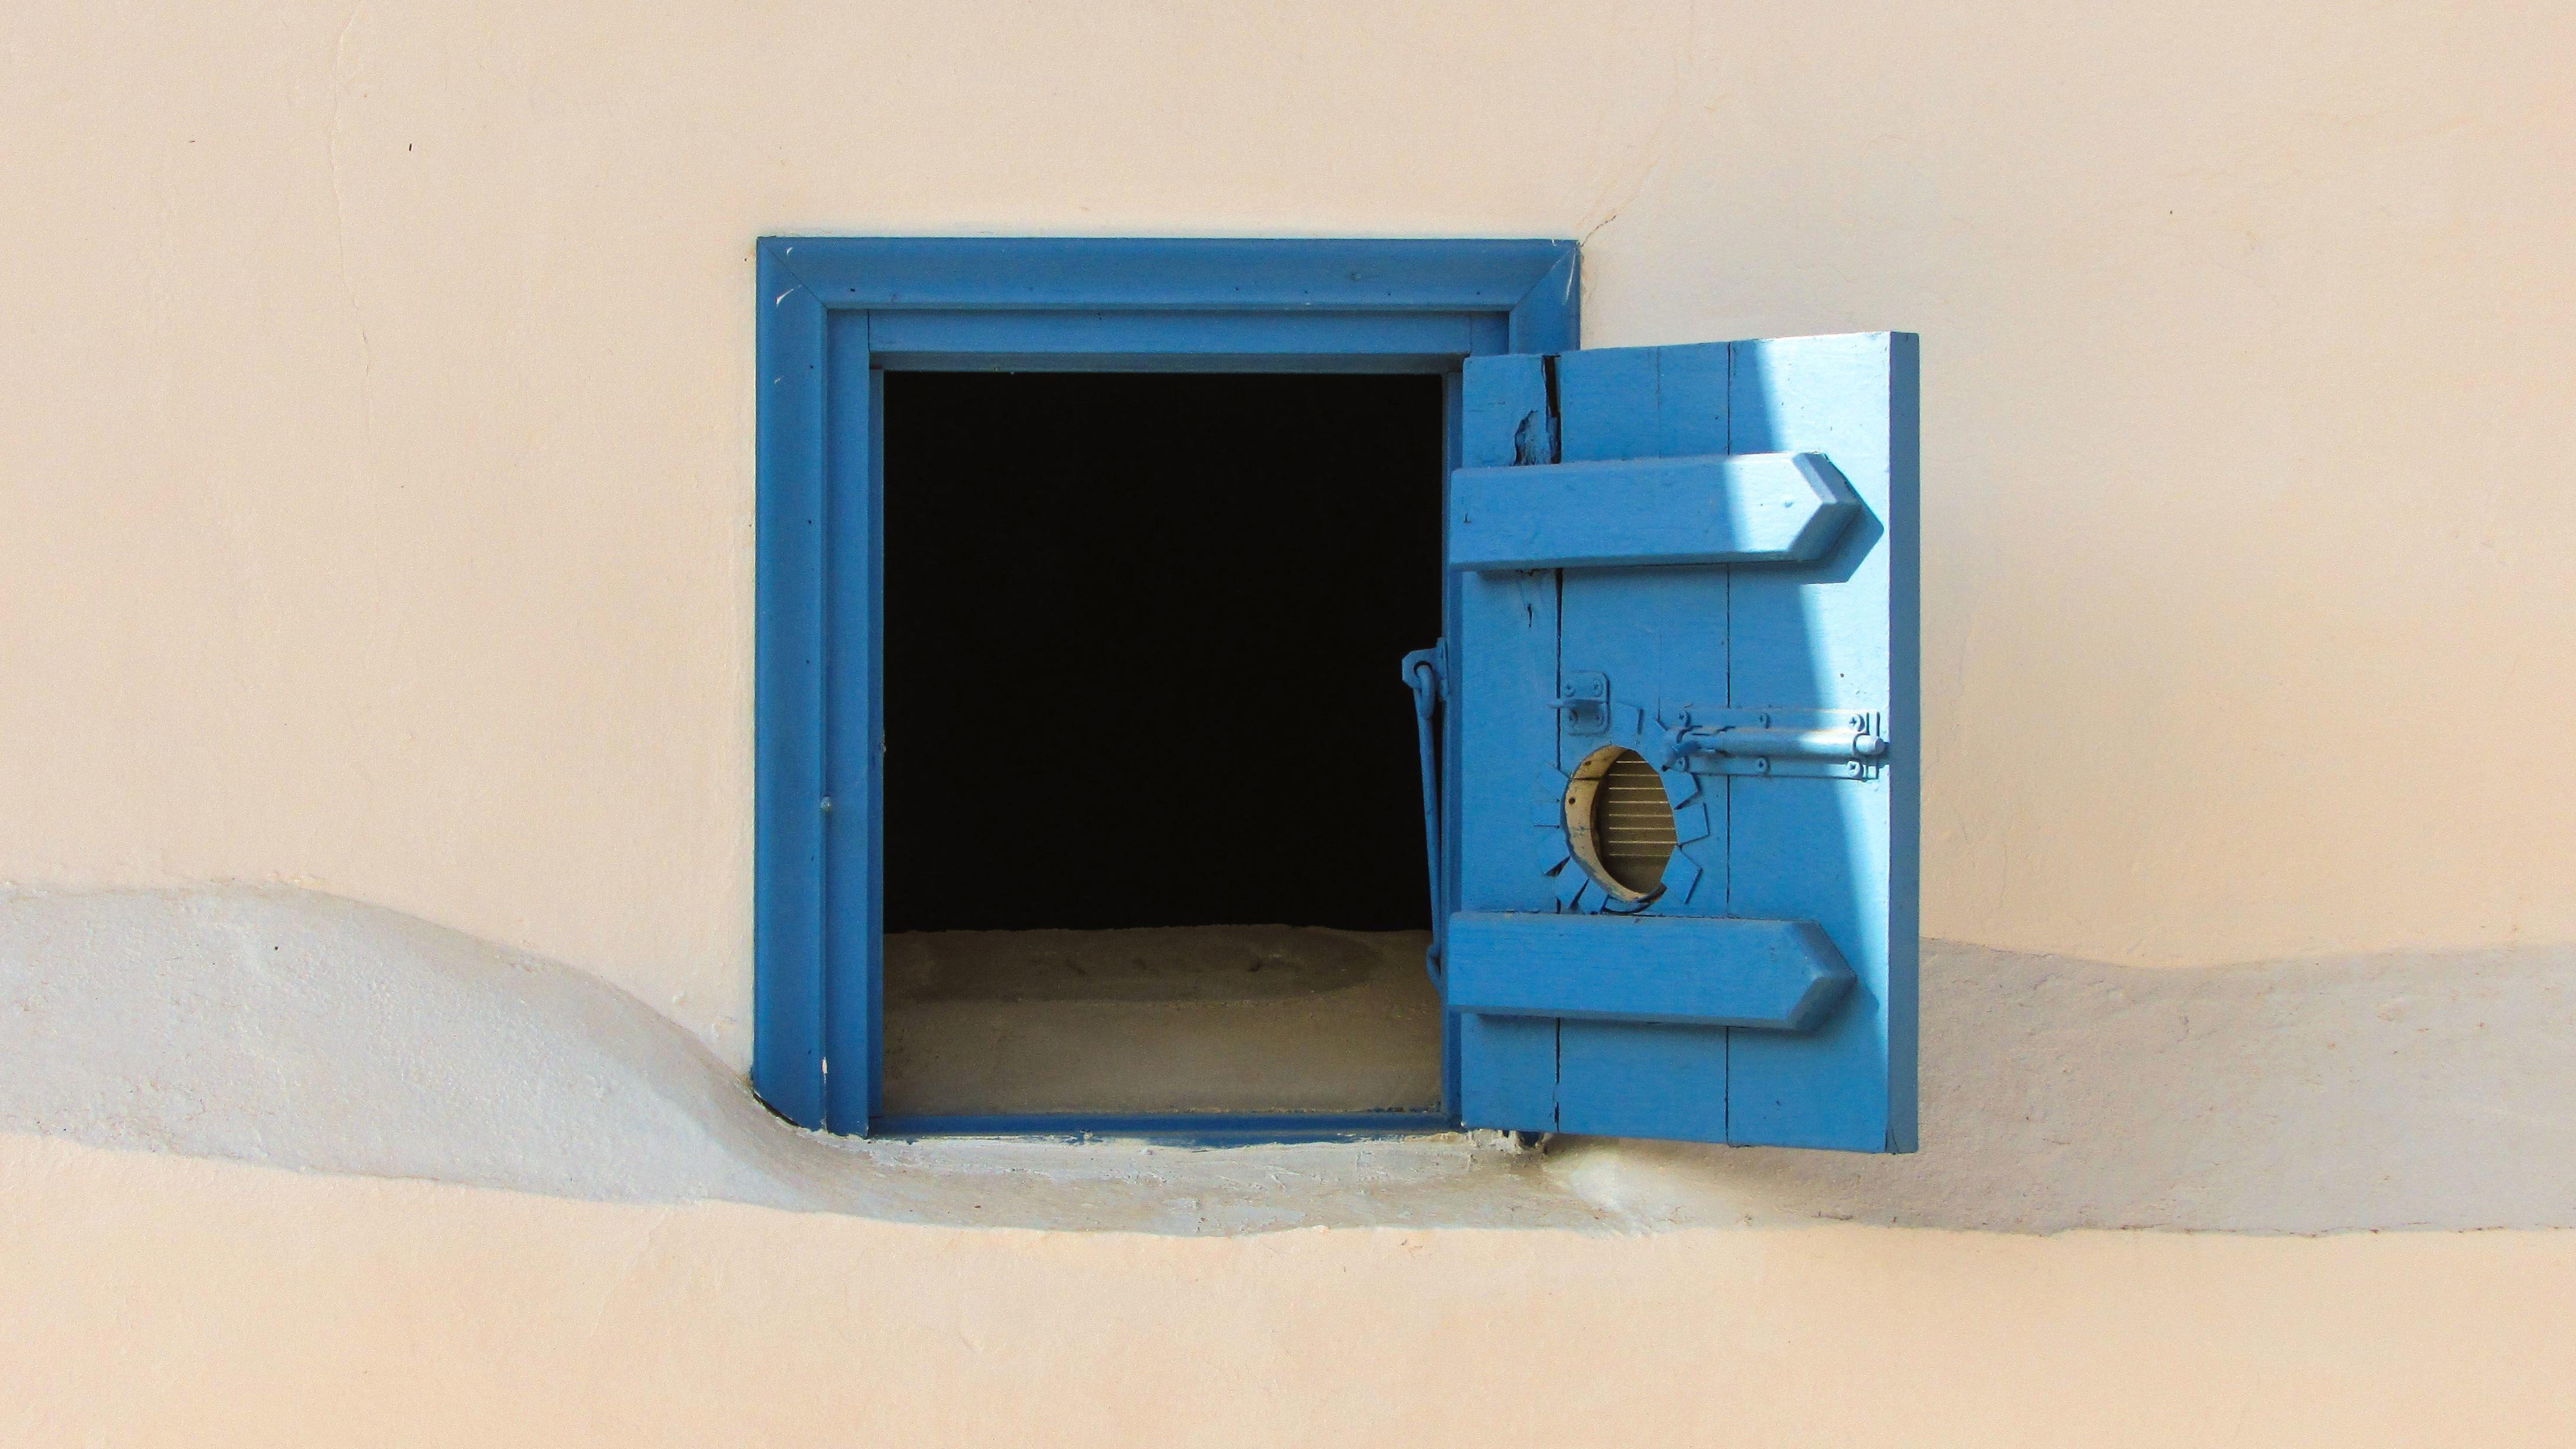 Image libre porte entr e maison bois for Porte fenetre in english